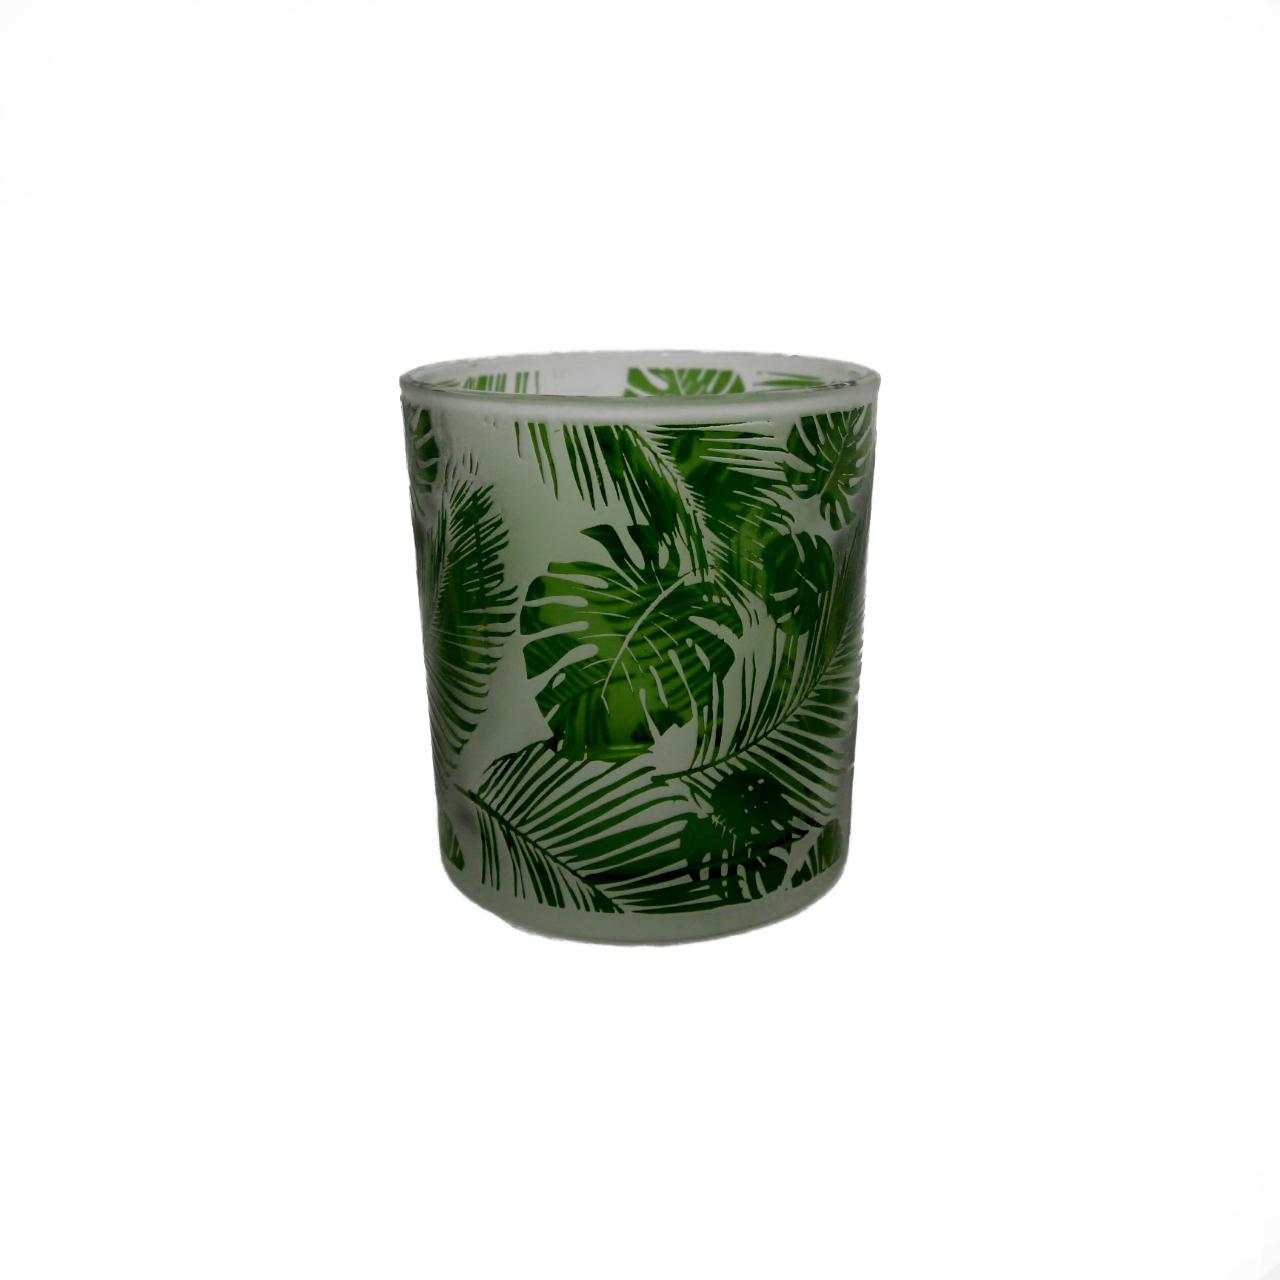 Castiçal Vidro All Leaves branco/verde 8x7cm Urban